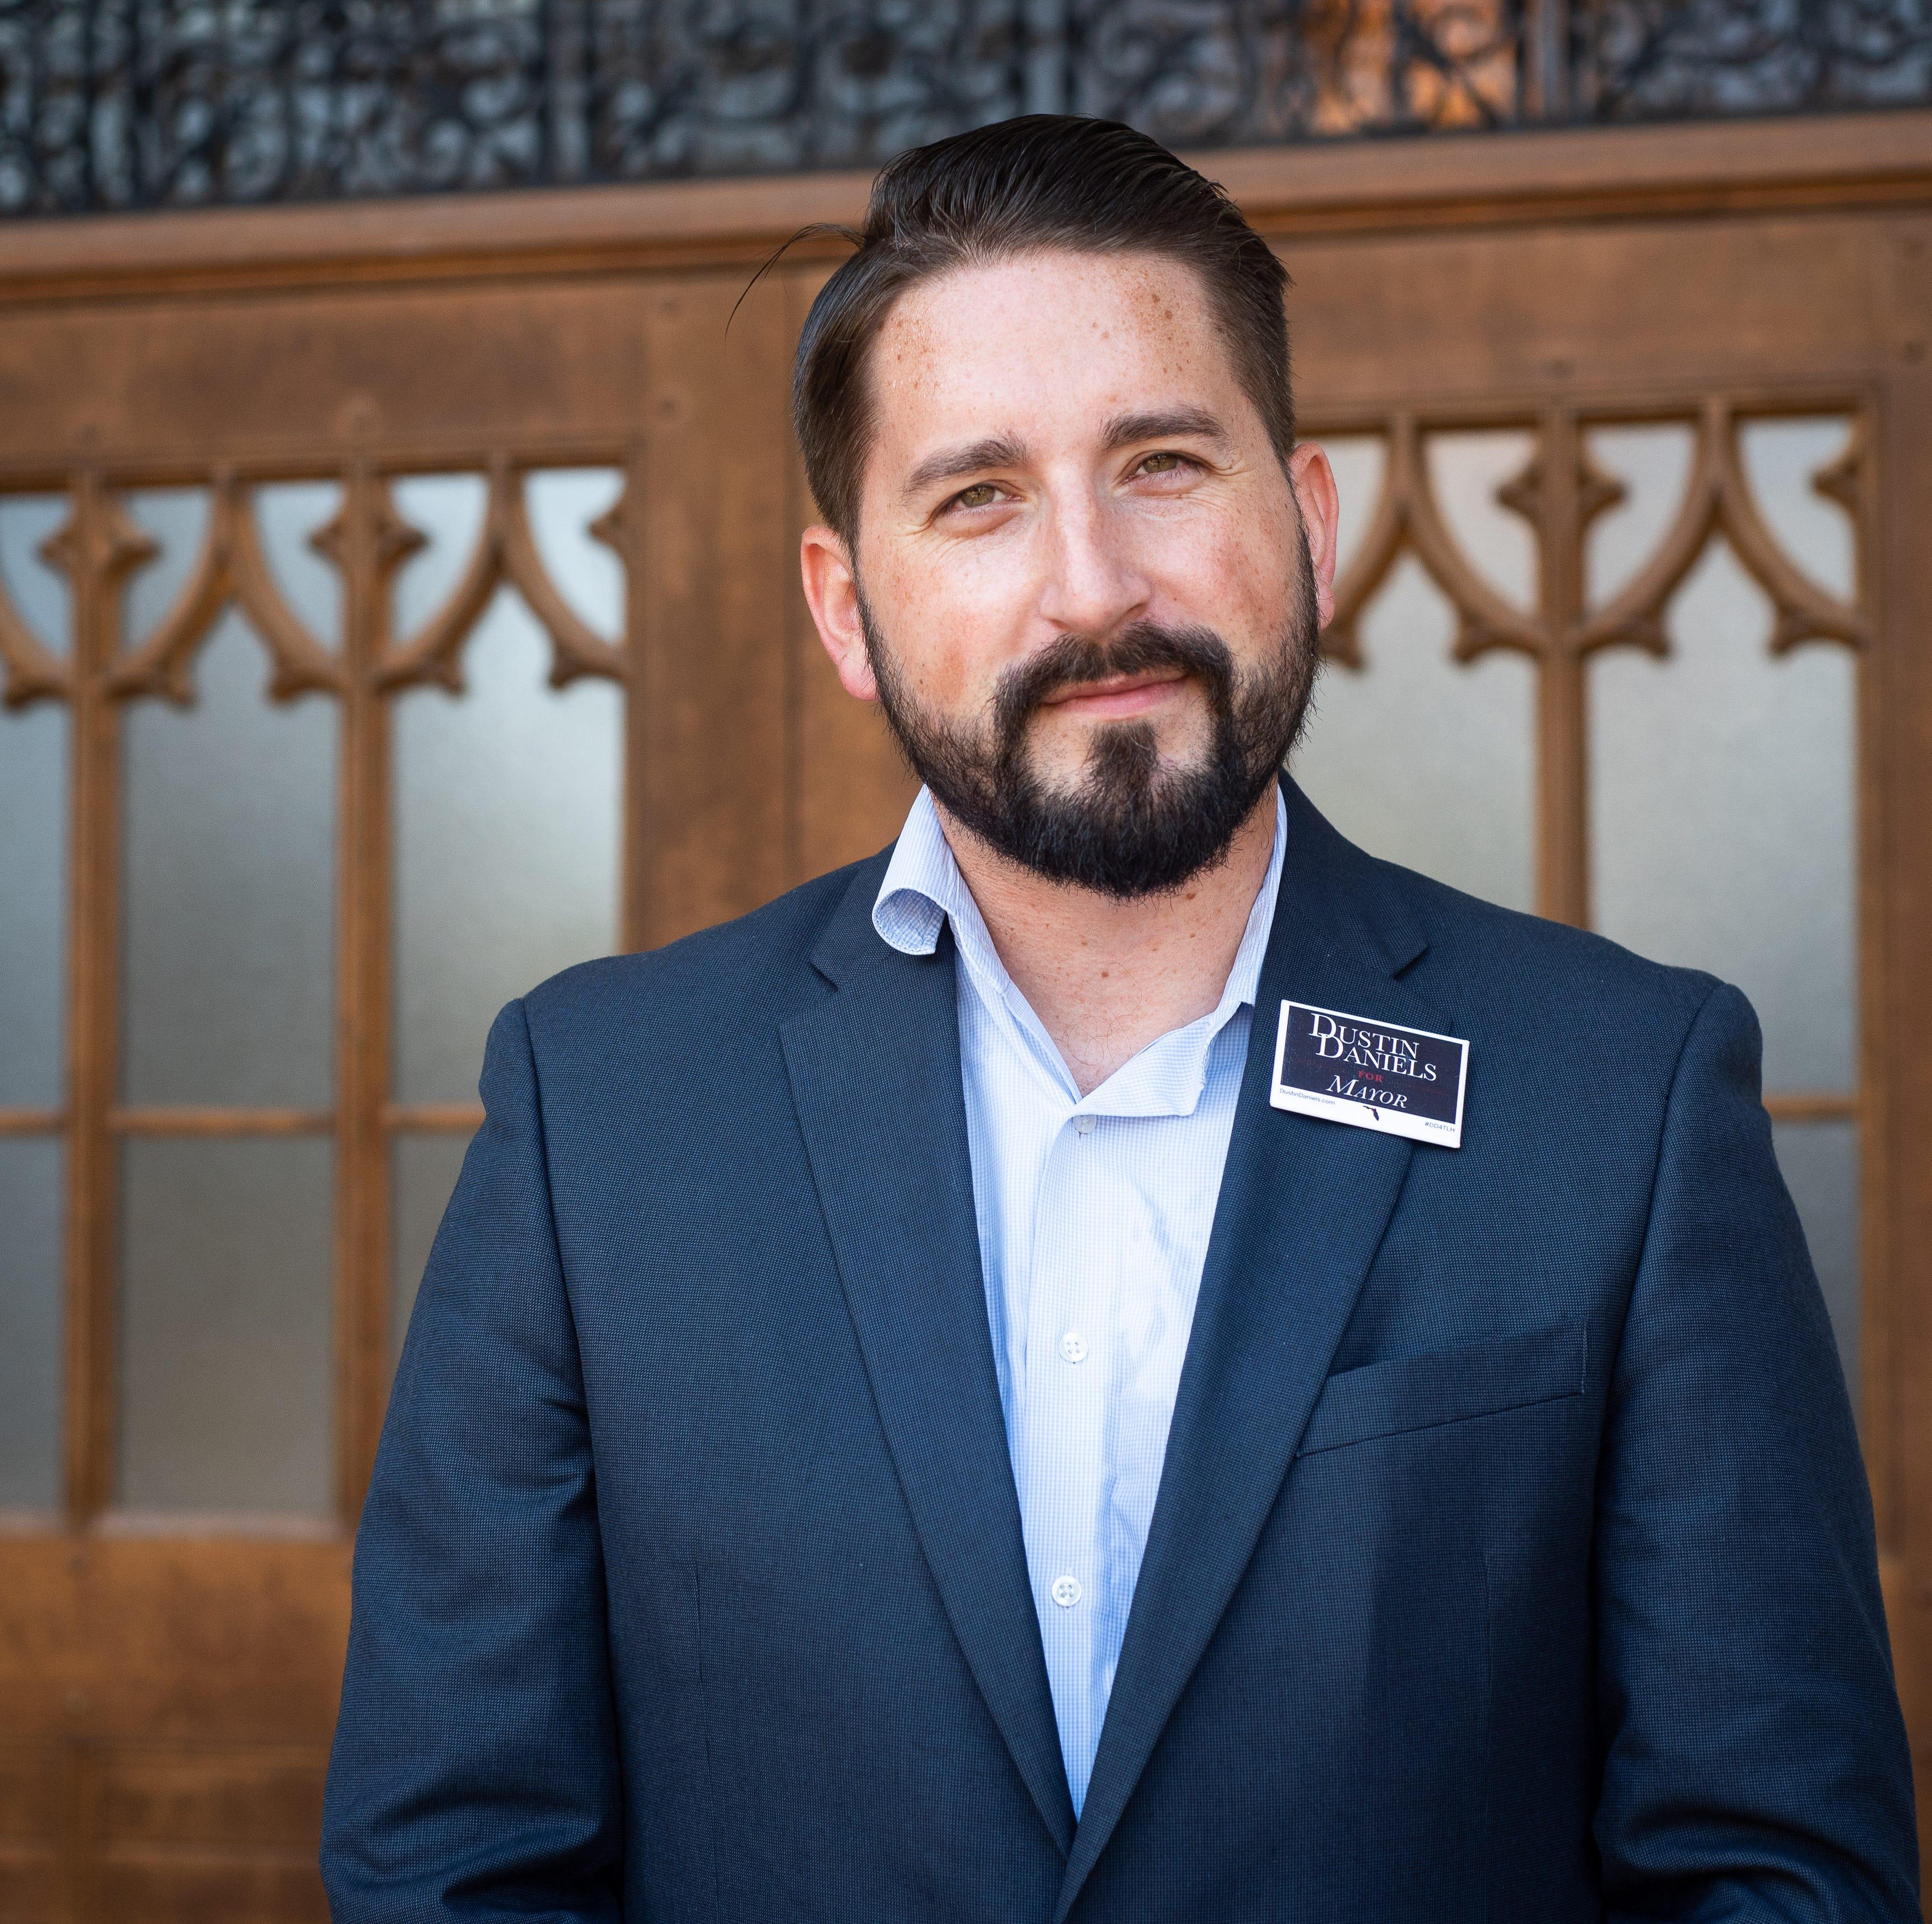 Mayoral candidate Dustin Daniels visits alma mater, discusses local politics